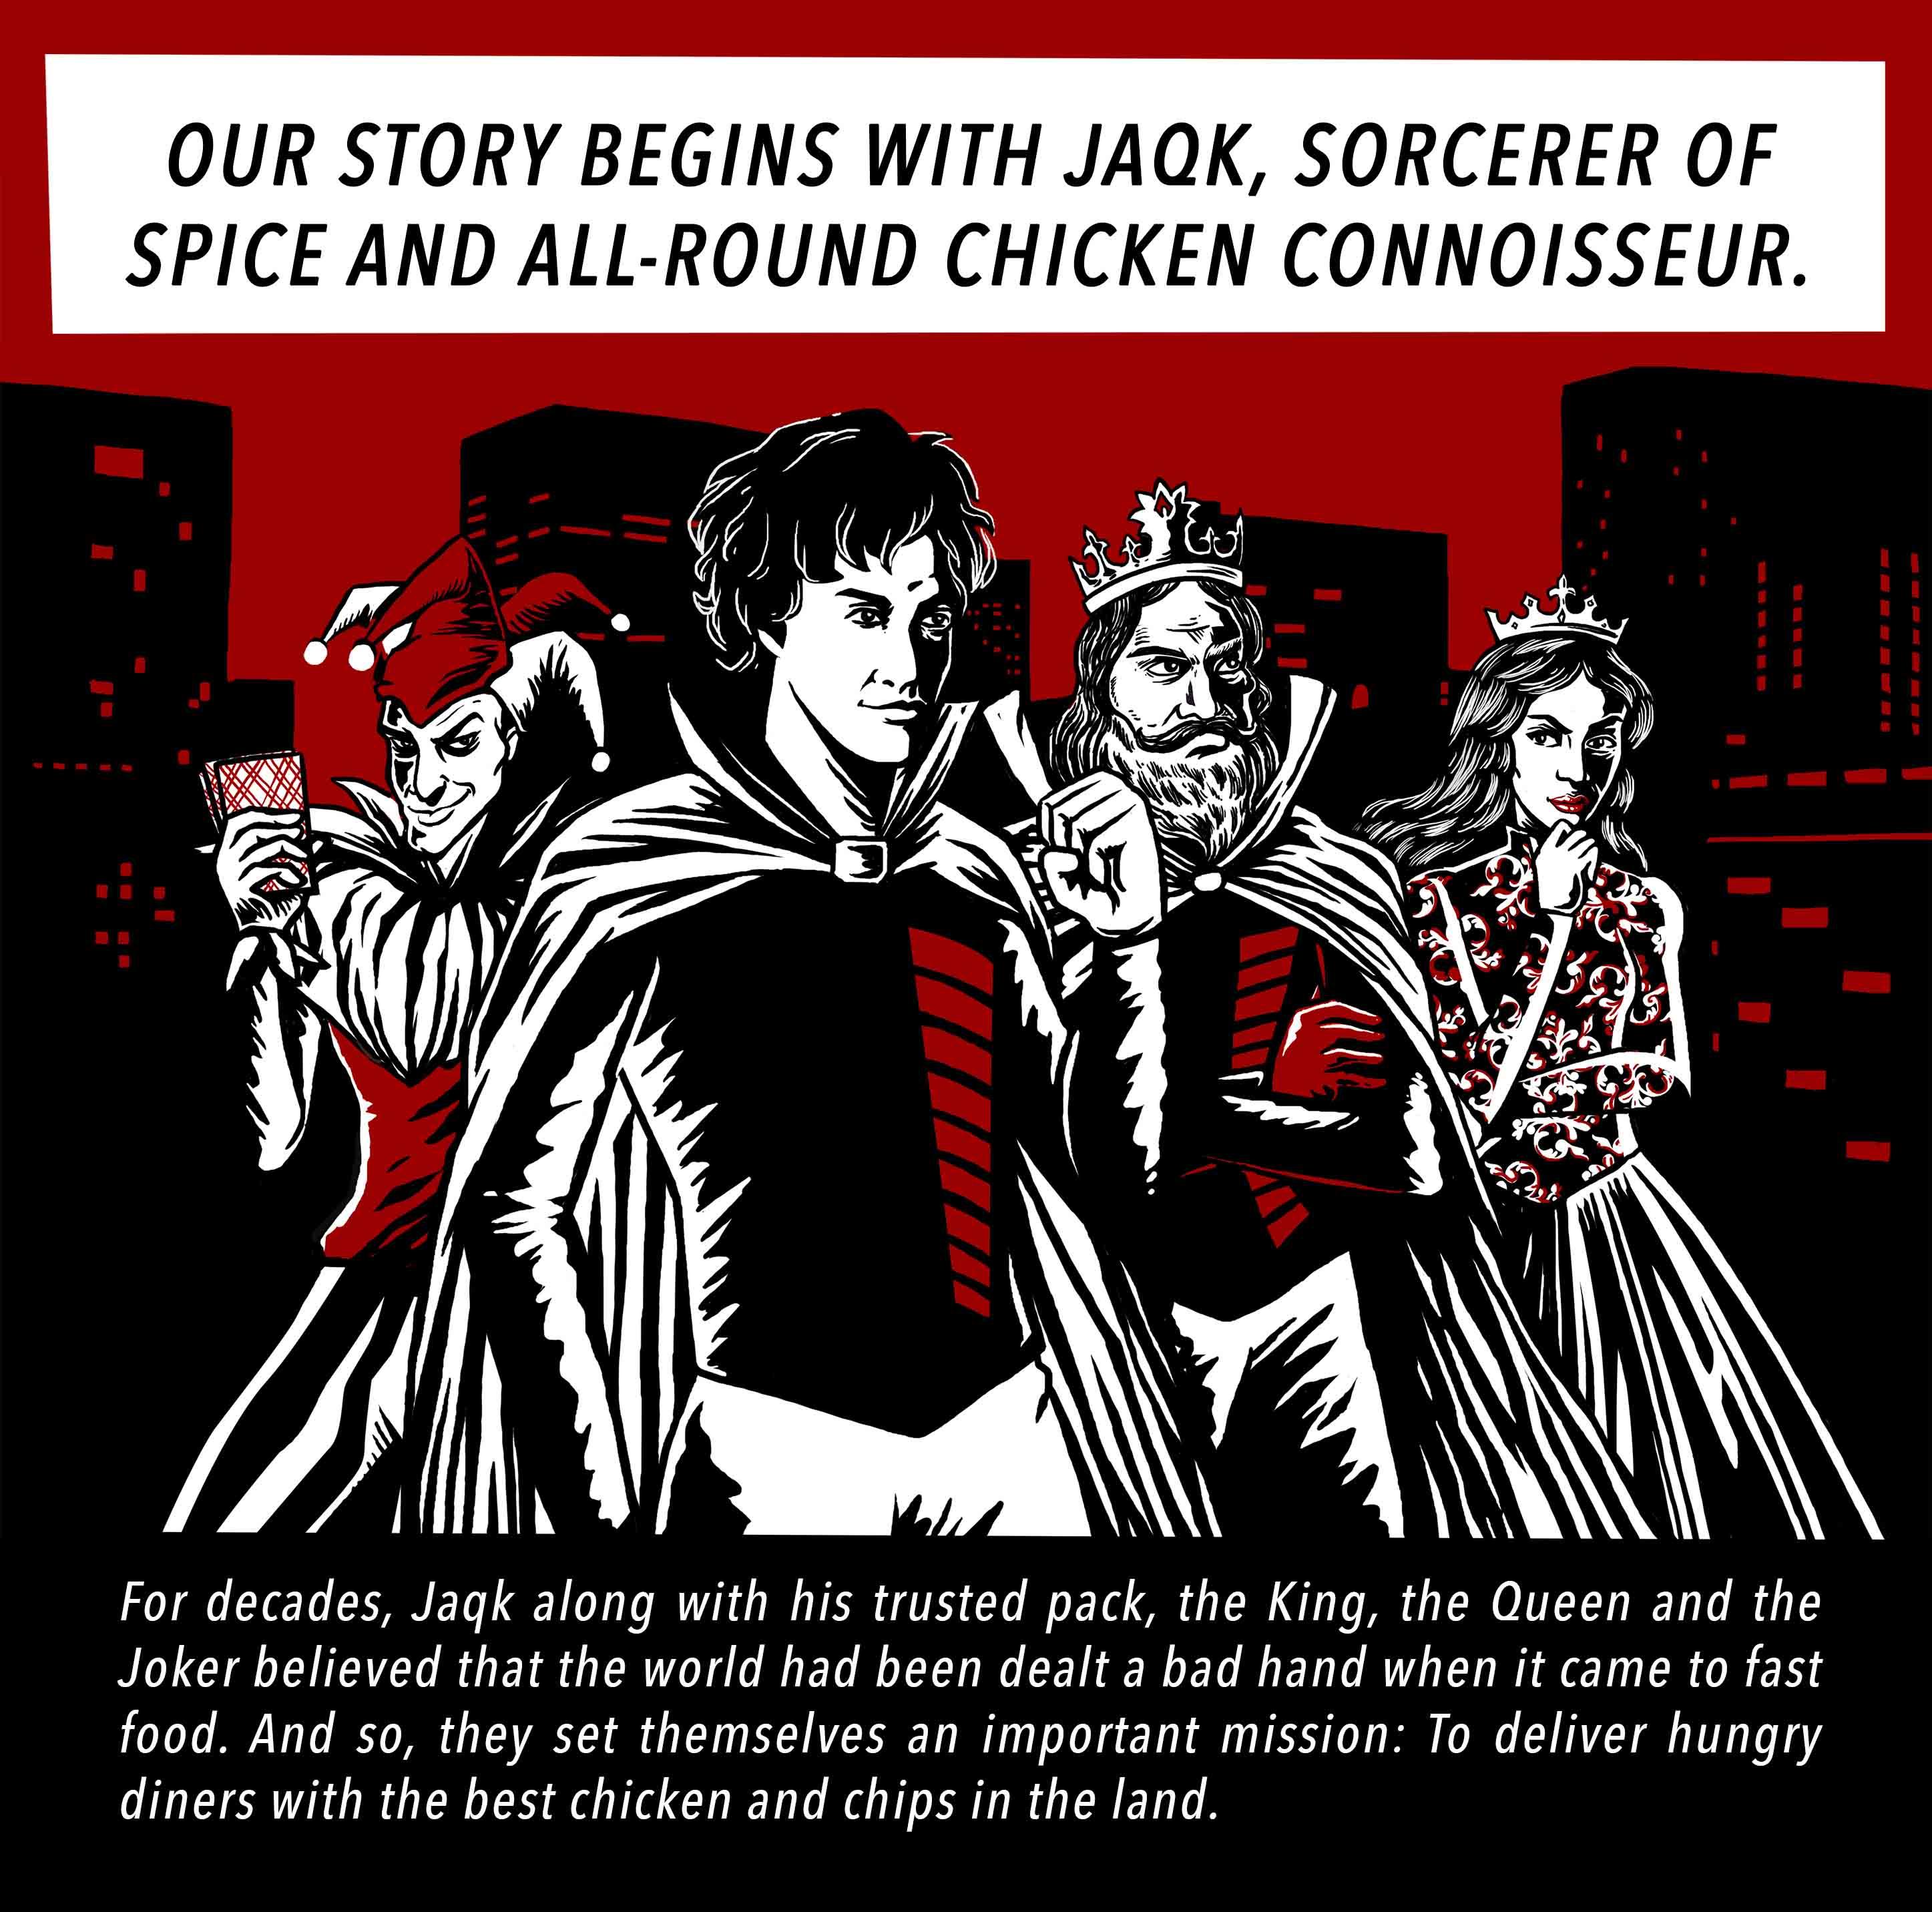 JAQK'S STORY 1